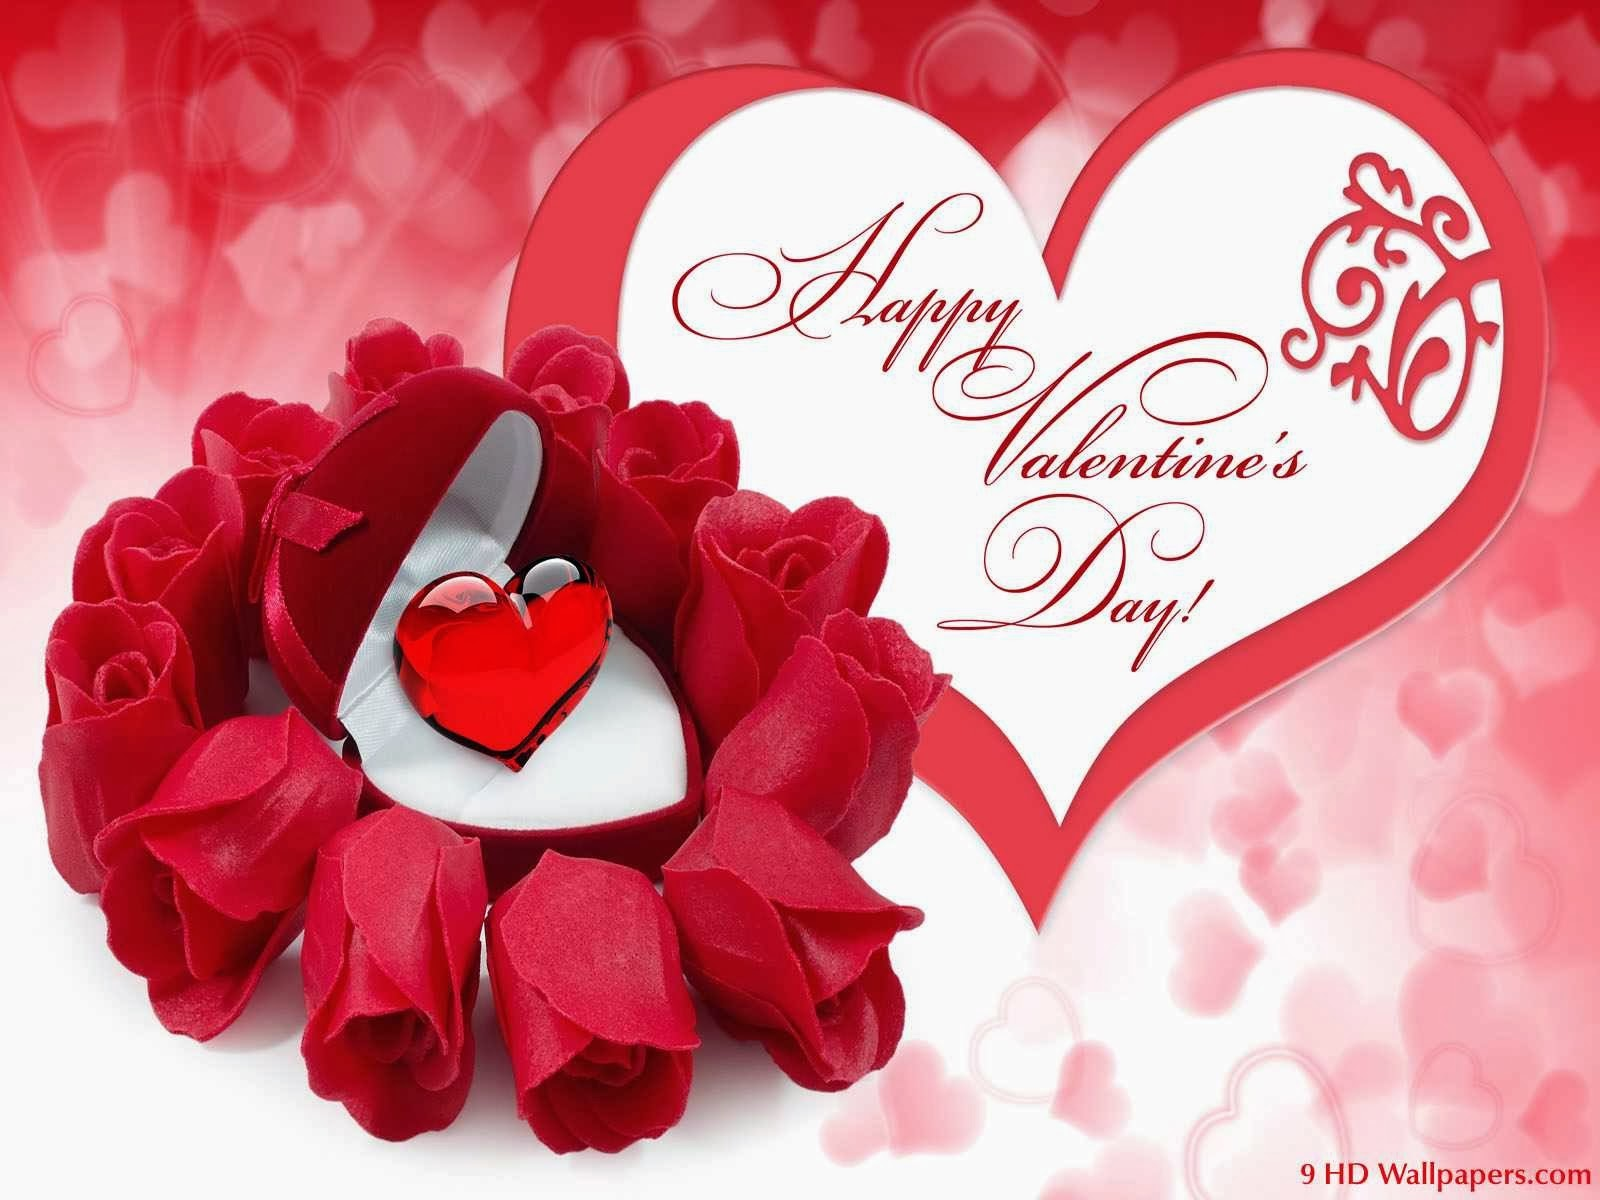 Kartu Ucapan Happy Valentine Day PUTIKUCOM Cari Kebutuhanmu